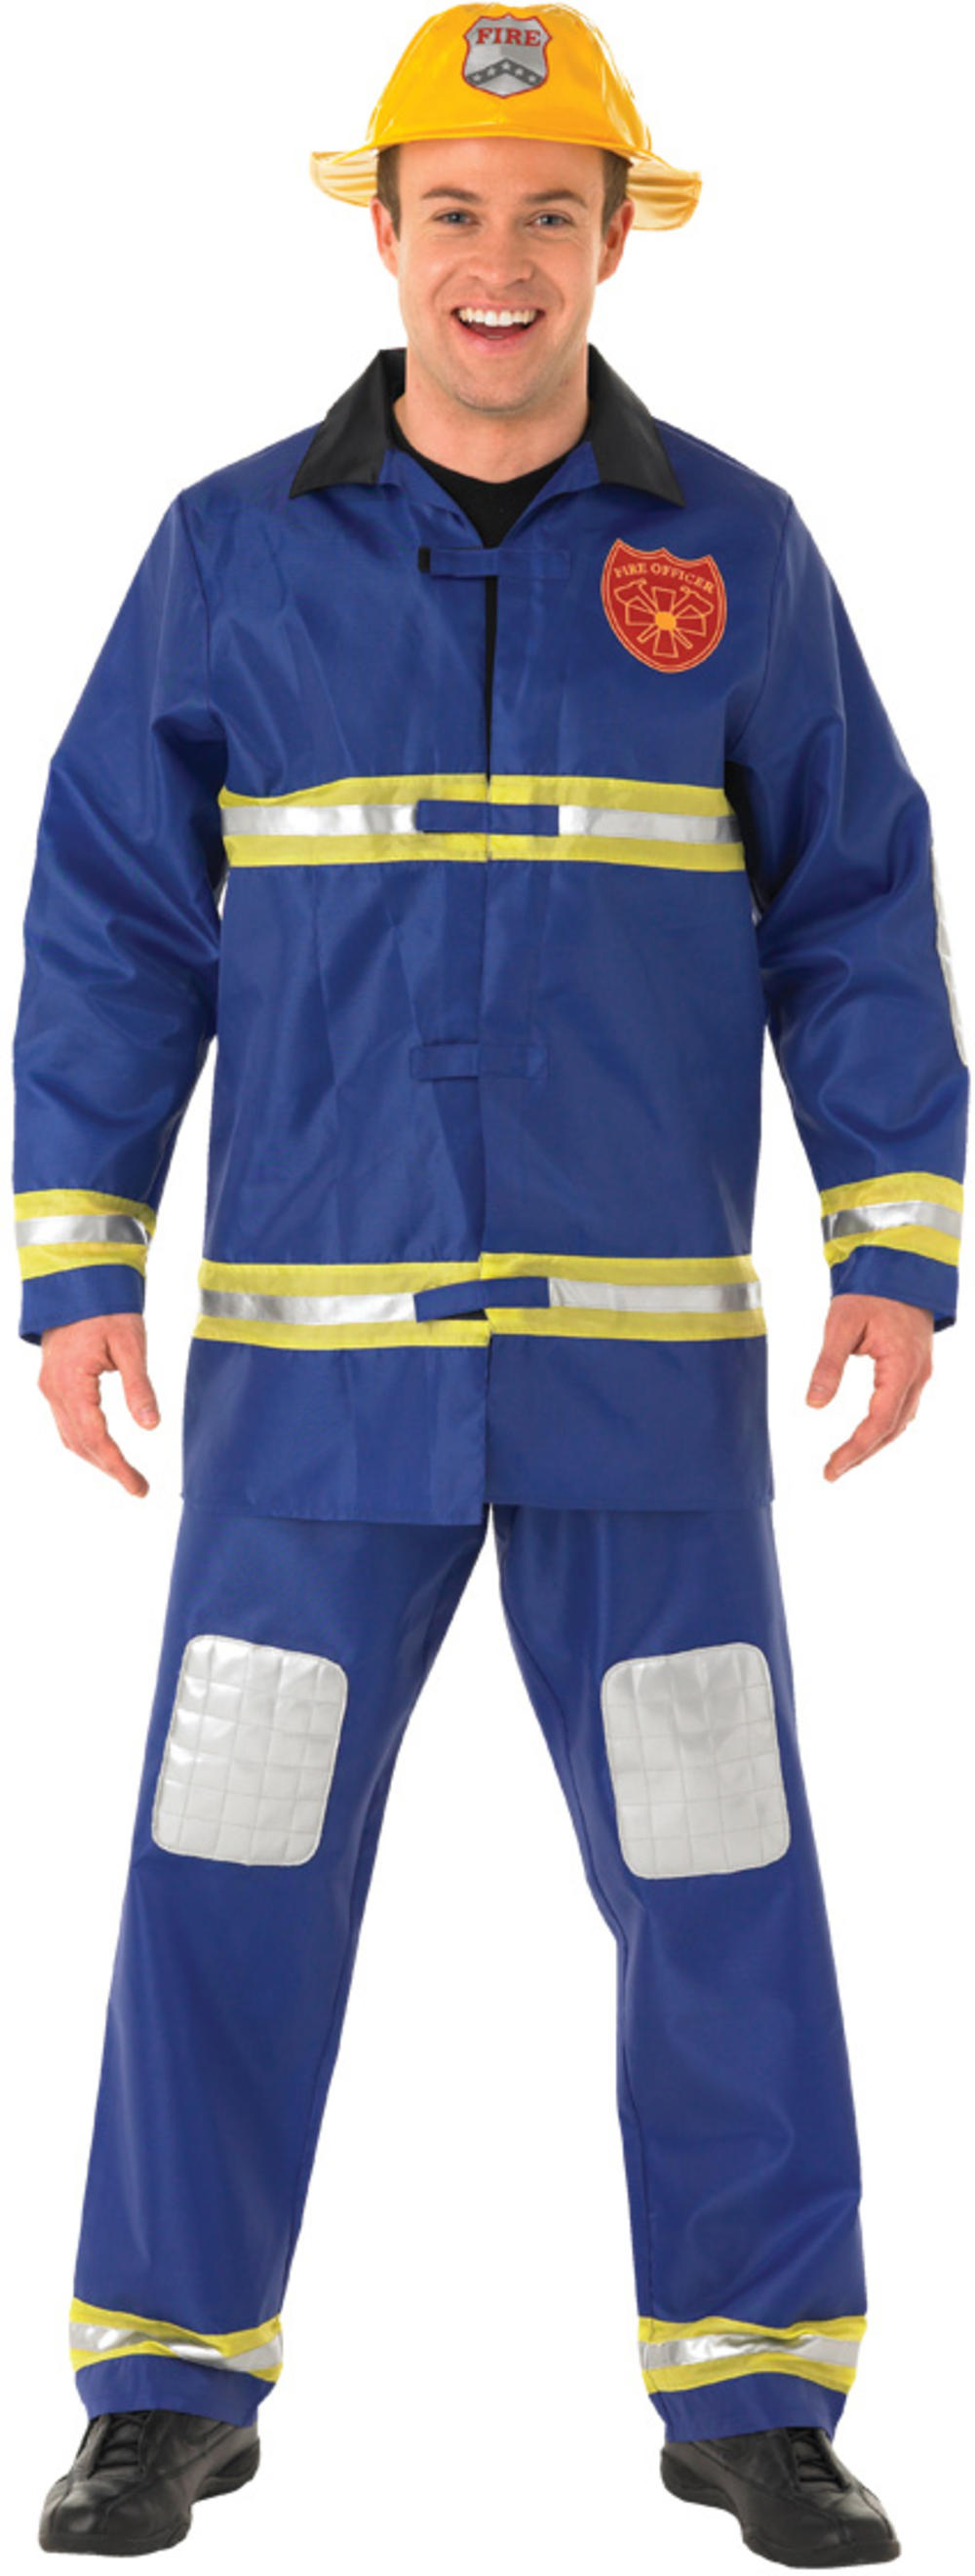 Fireman Mens Fancy Dress Fire Fighter Emergency Services Uniform Adults Costume